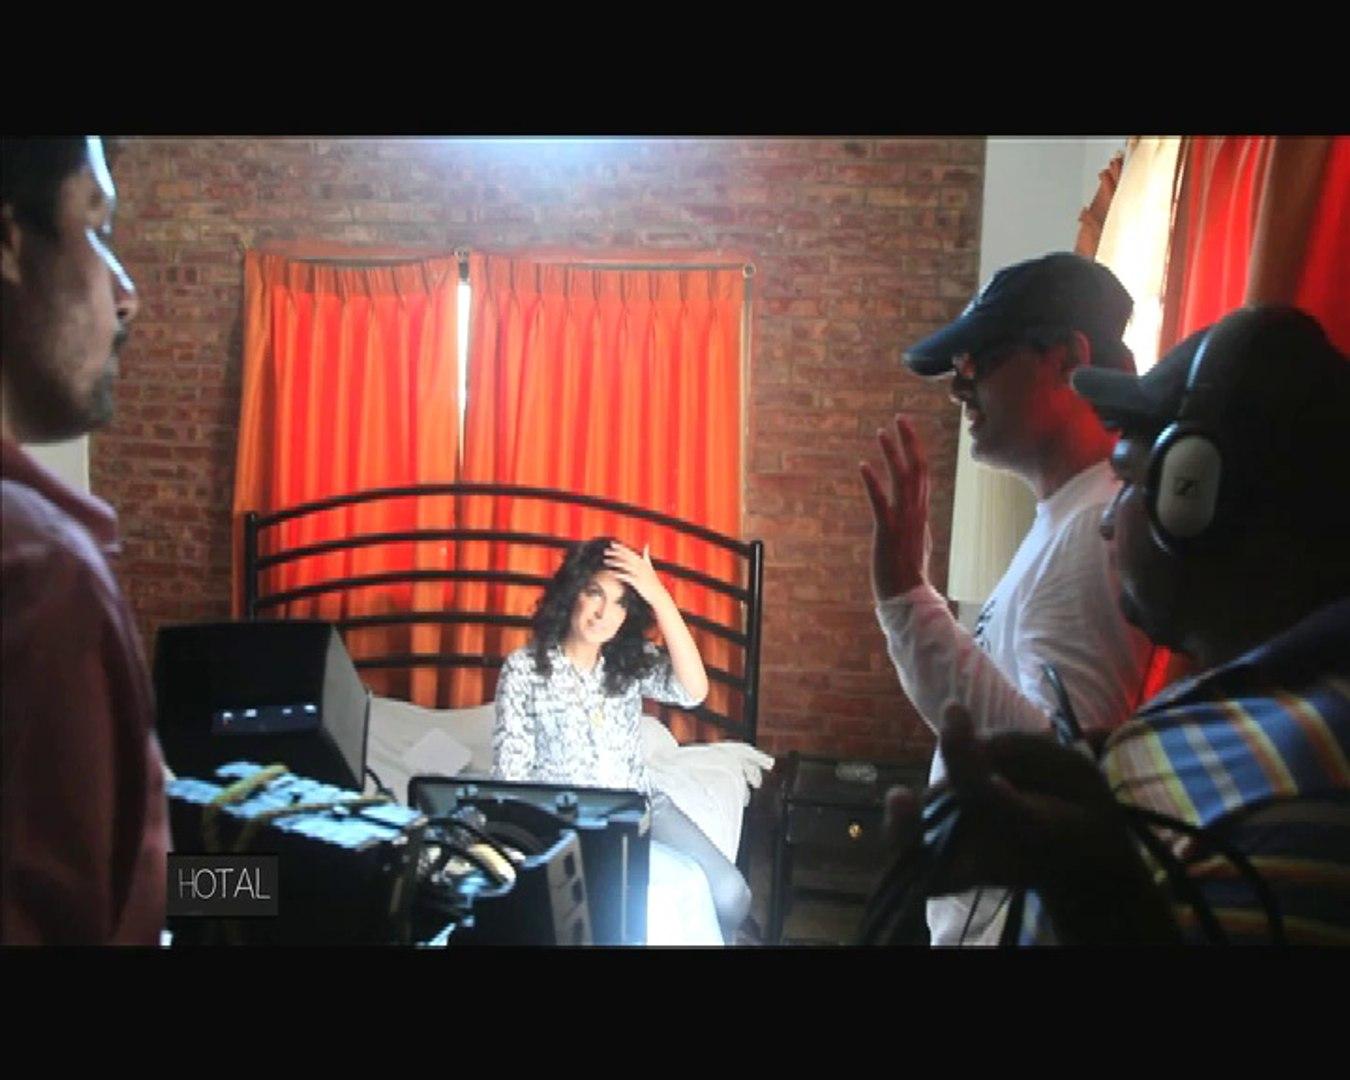 HOTAL Behind The Scenes (II)